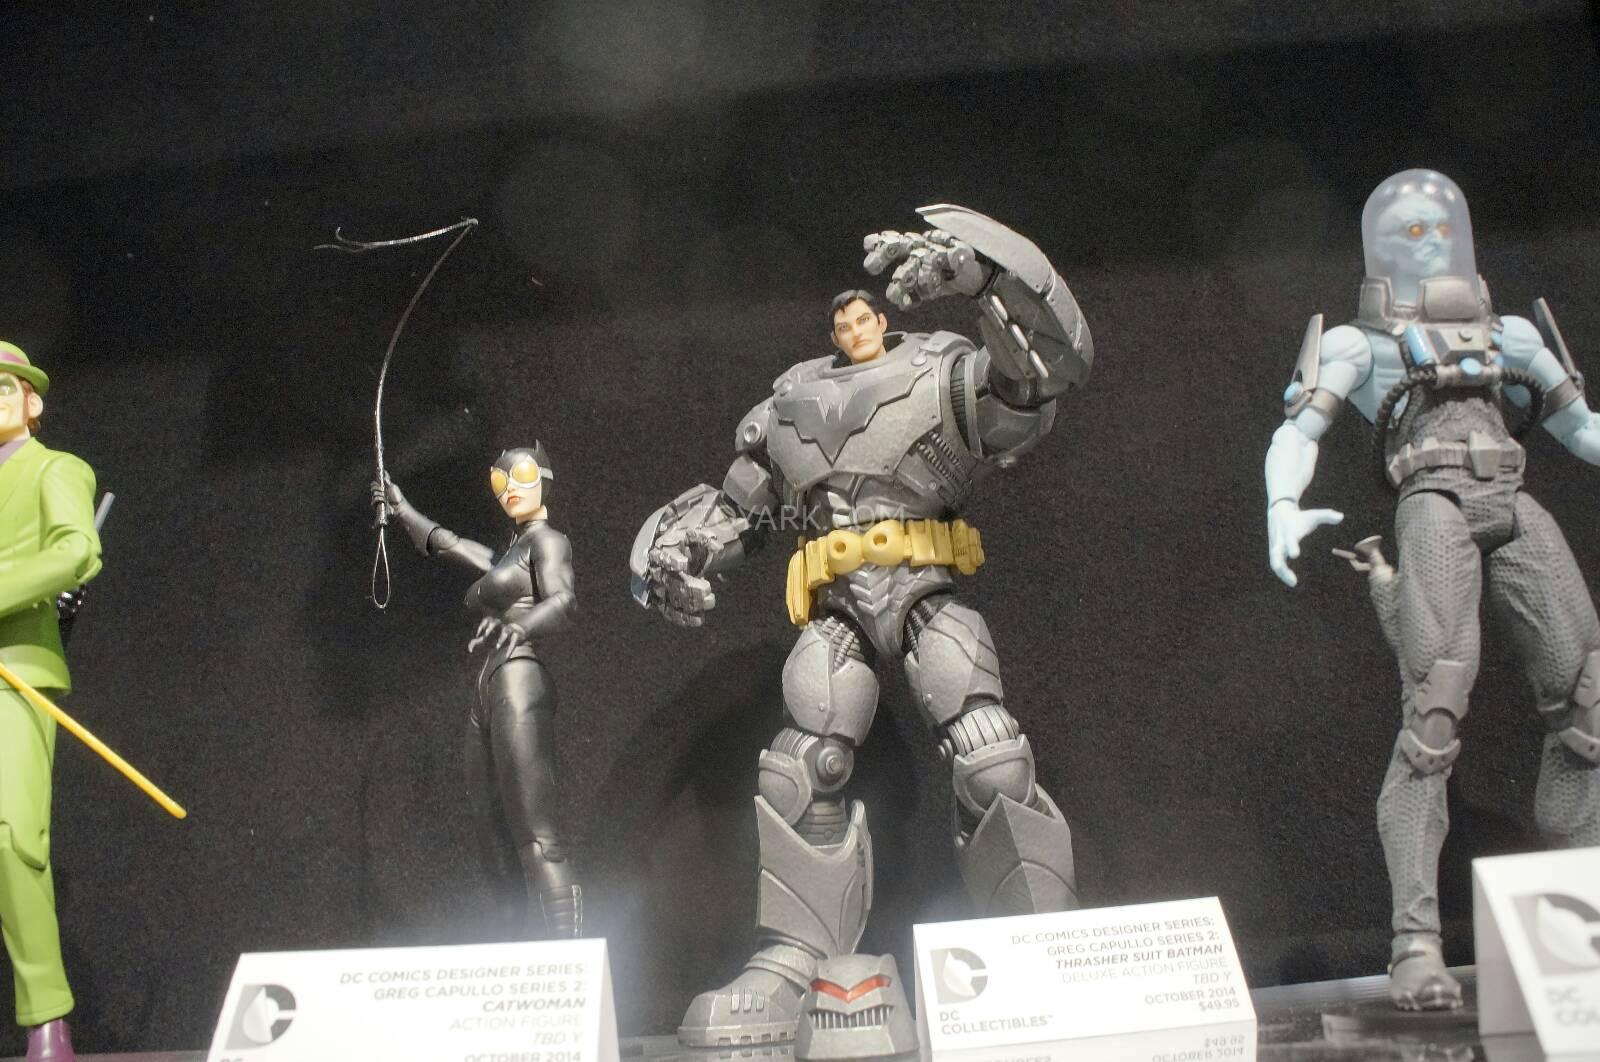 [Toy Fair 2014] DC Collectibles Toy-Fair-2014-DC-Collectibles-098